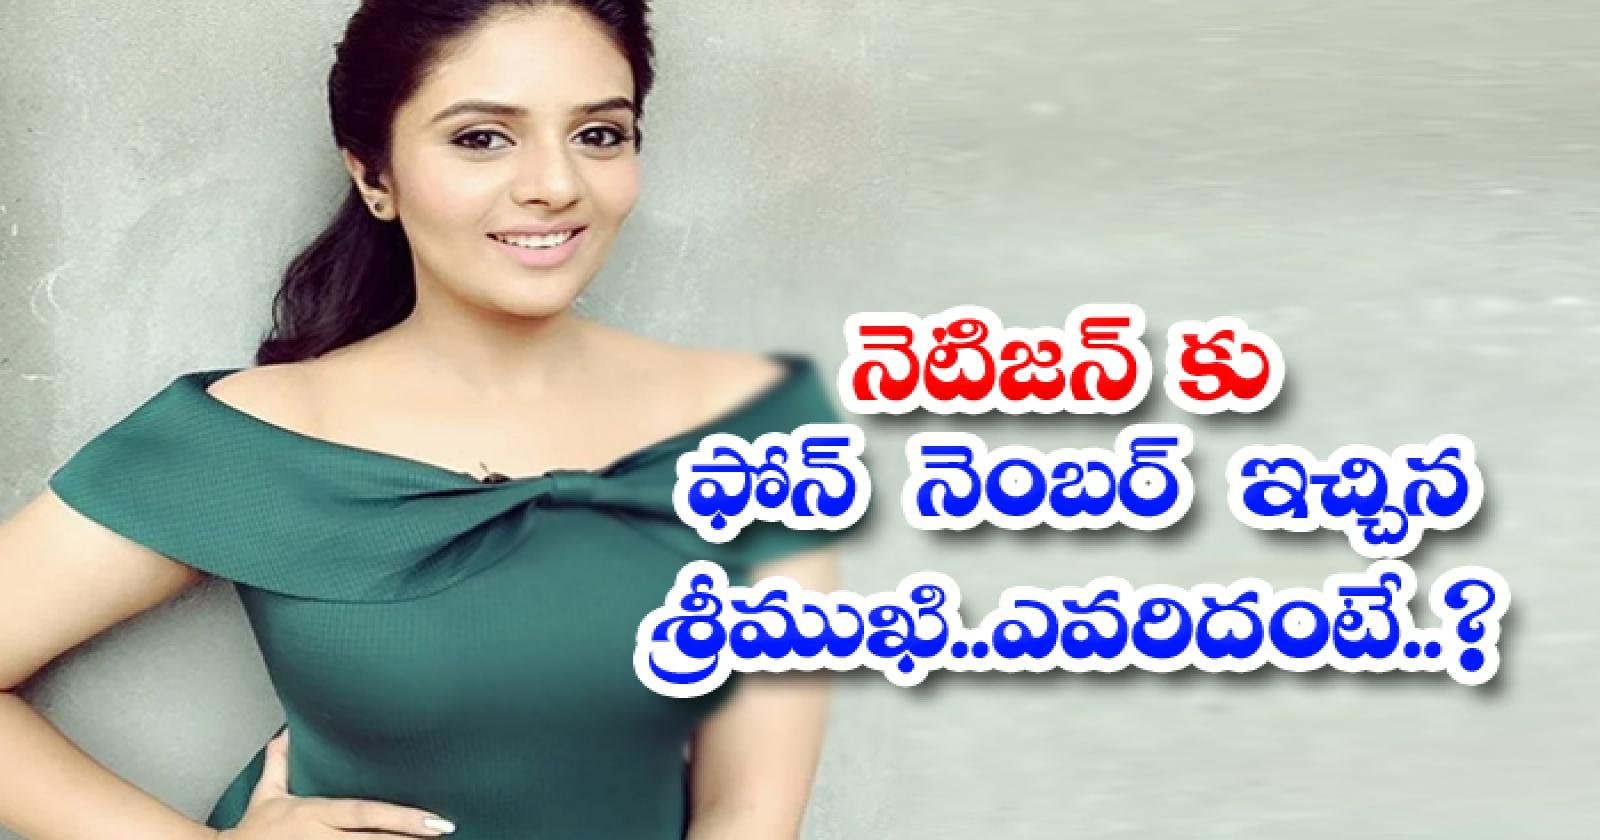 Sreemukhi Gave Her Phone Number Due To Her Fans Request-నెటిజన్ కు ఫోన్ నంబర్ ఇచ్చిన శ్రీముఖి.. ఎవరిదంటే..-Latest News - Telugu-Telugu Tollywood Photo Image-TeluguStop.com